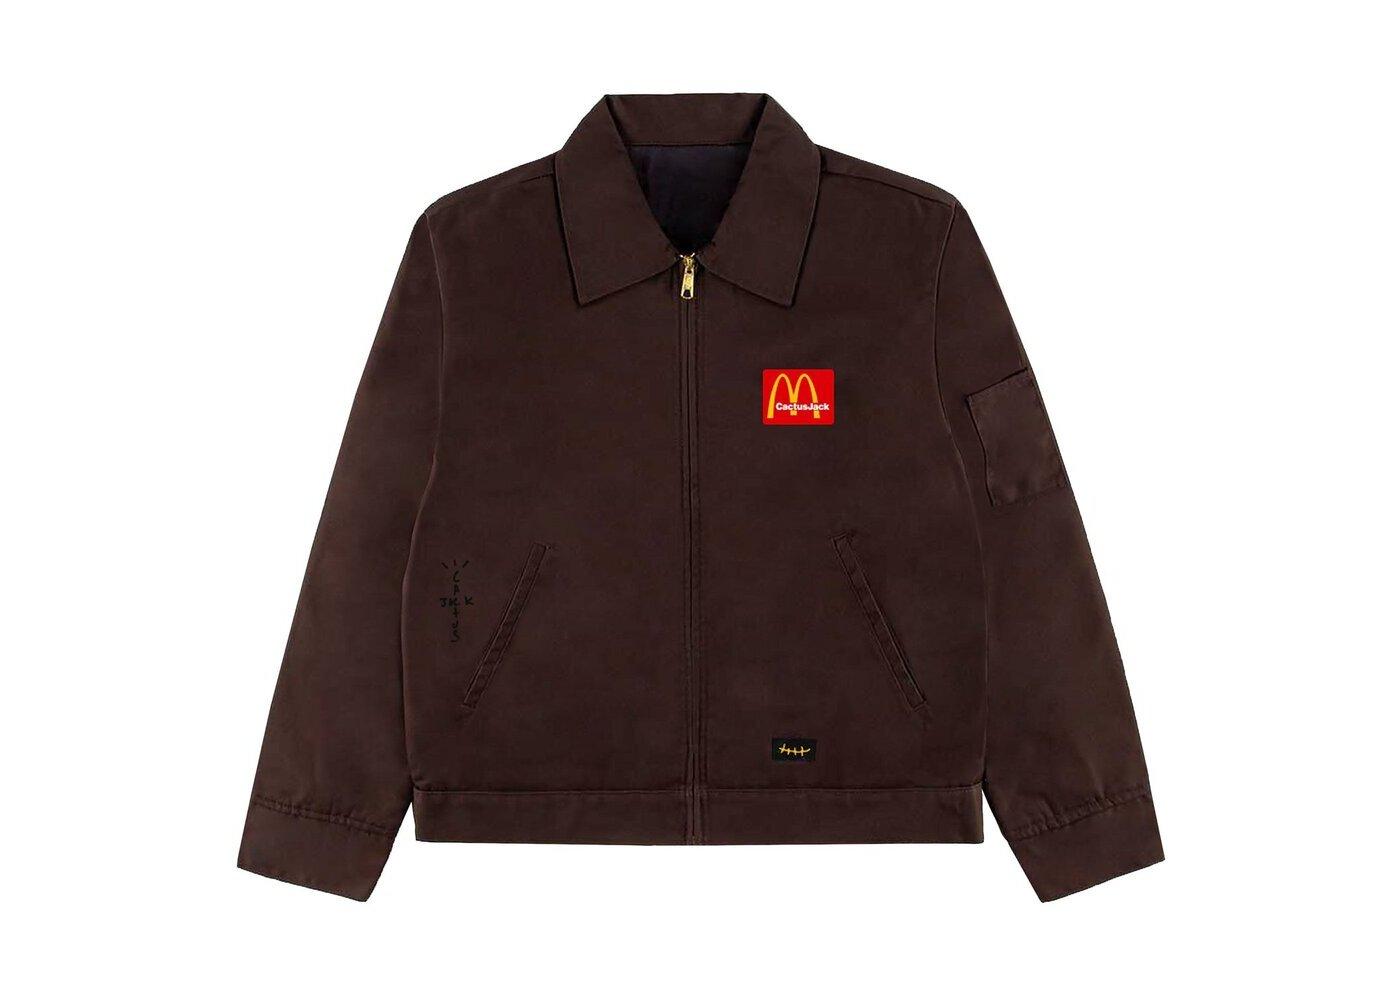 Travis Scott x McDonald's Billions Served Work Jacket Brownの写真